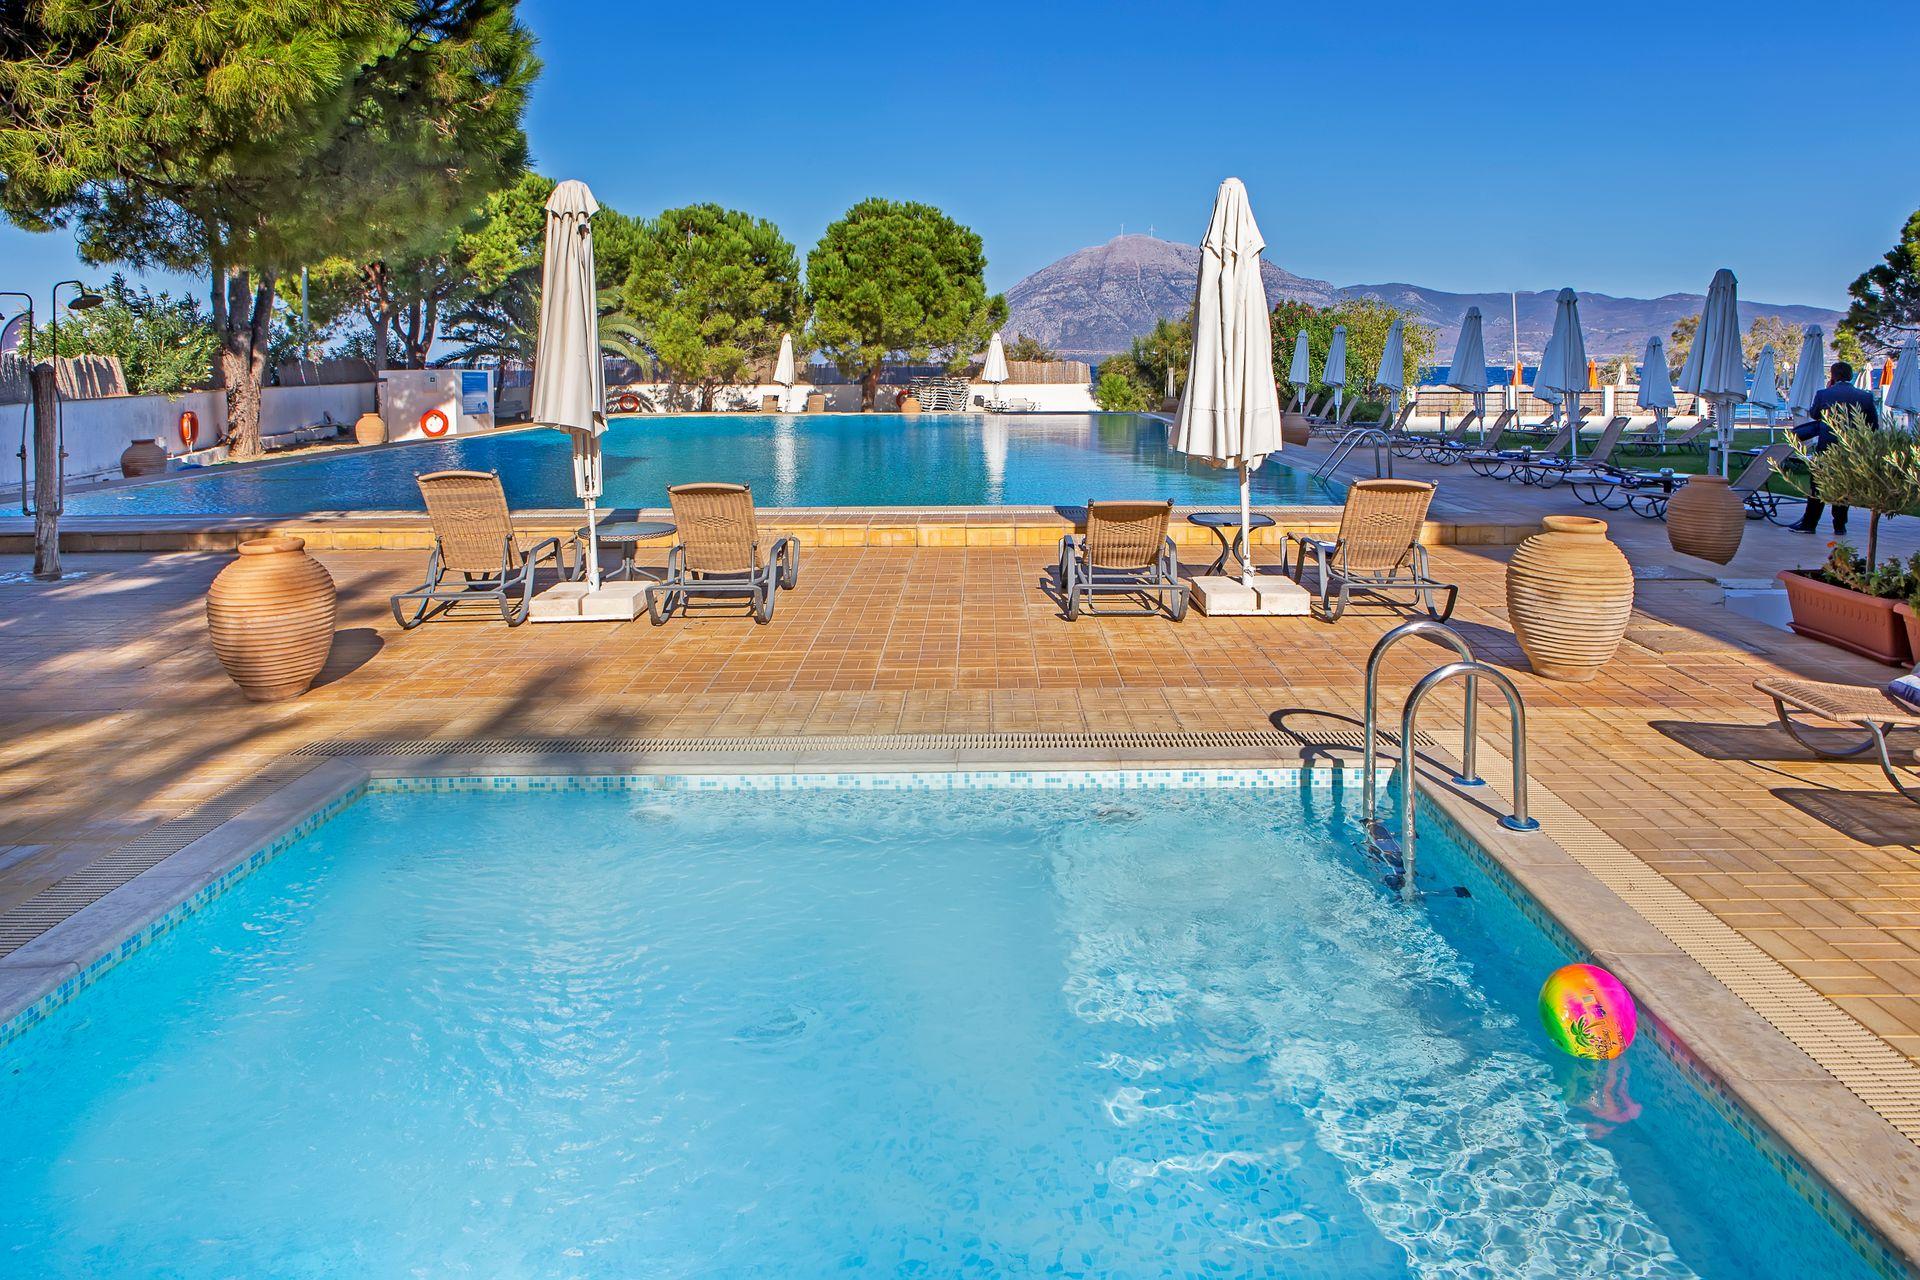 4* Airotel Achaia Beach Hotel – Πατρα ✦ 3 Ημερες (2 Διανυκτερευσεις) ✦ 2 Άτομα ✦ All Inclusive ✦ εως 30/09/2018 ✦ Ιδιωτικη Παραλια!